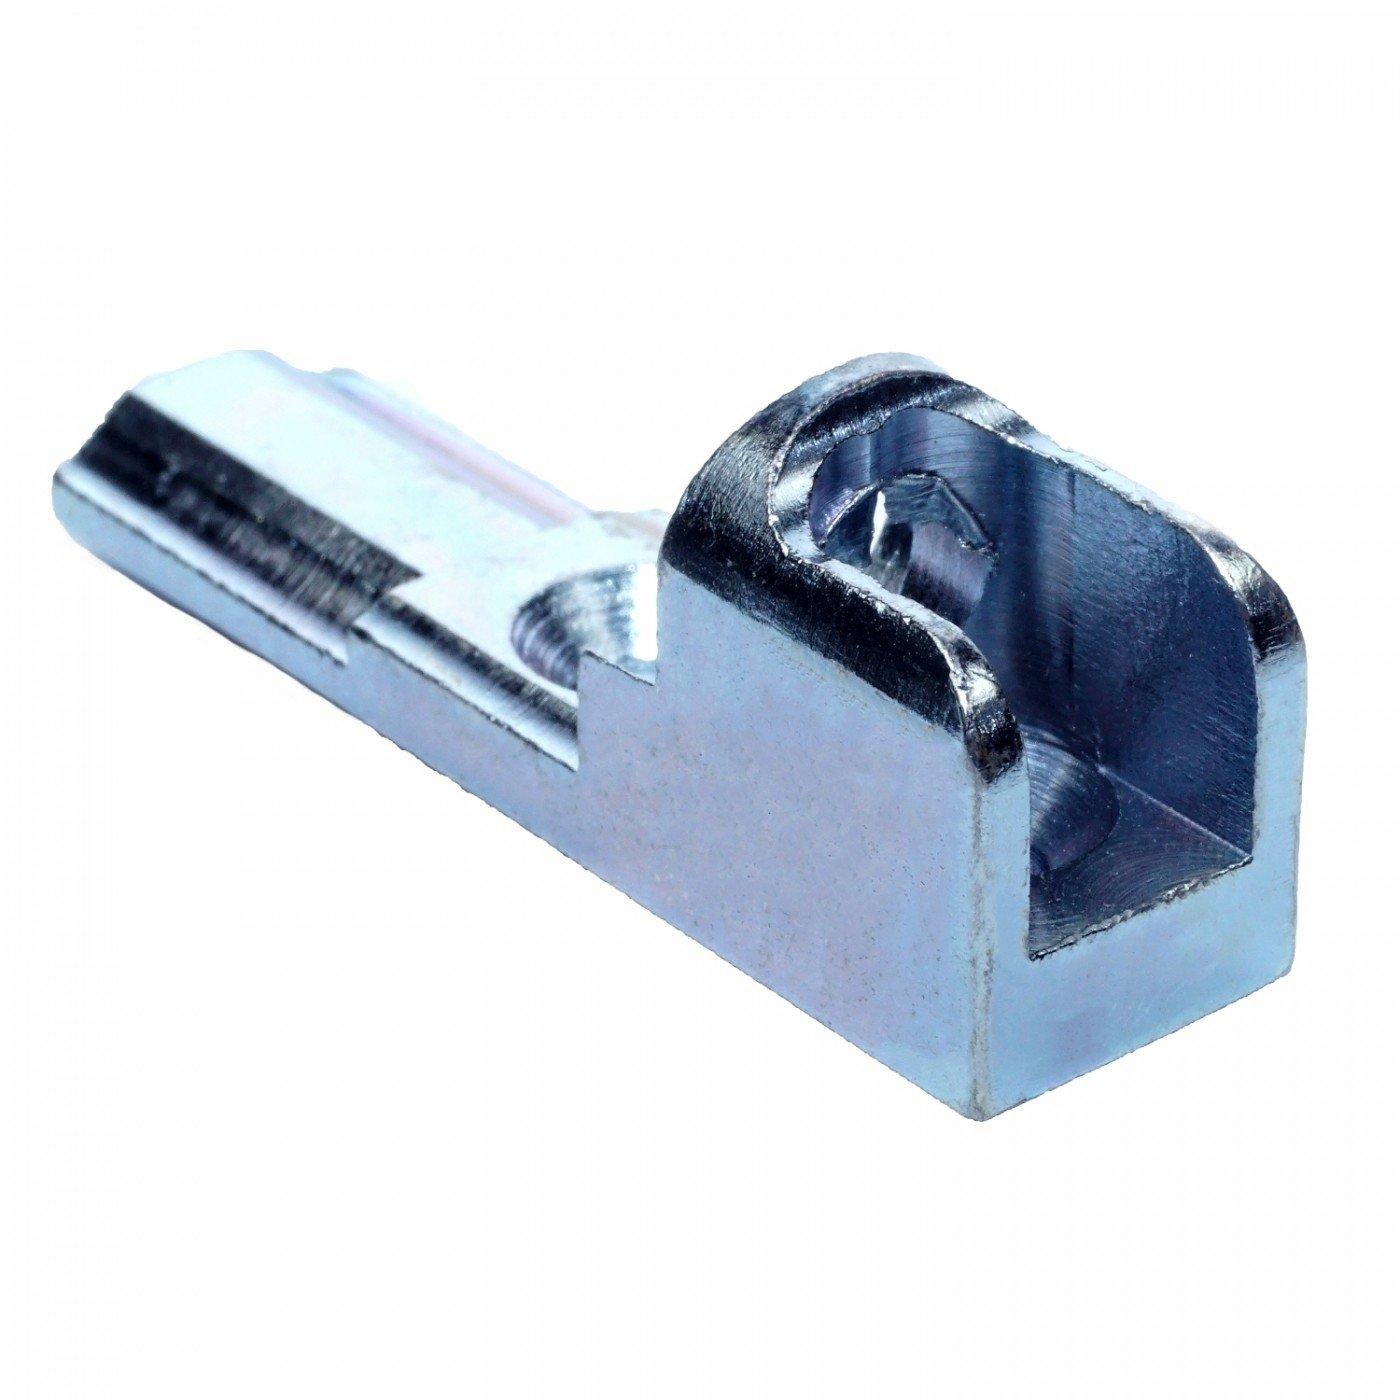 GEZE Ecklager 8301 für Aluminium Fenster silber verzinkt ToniTec® Reproduktion